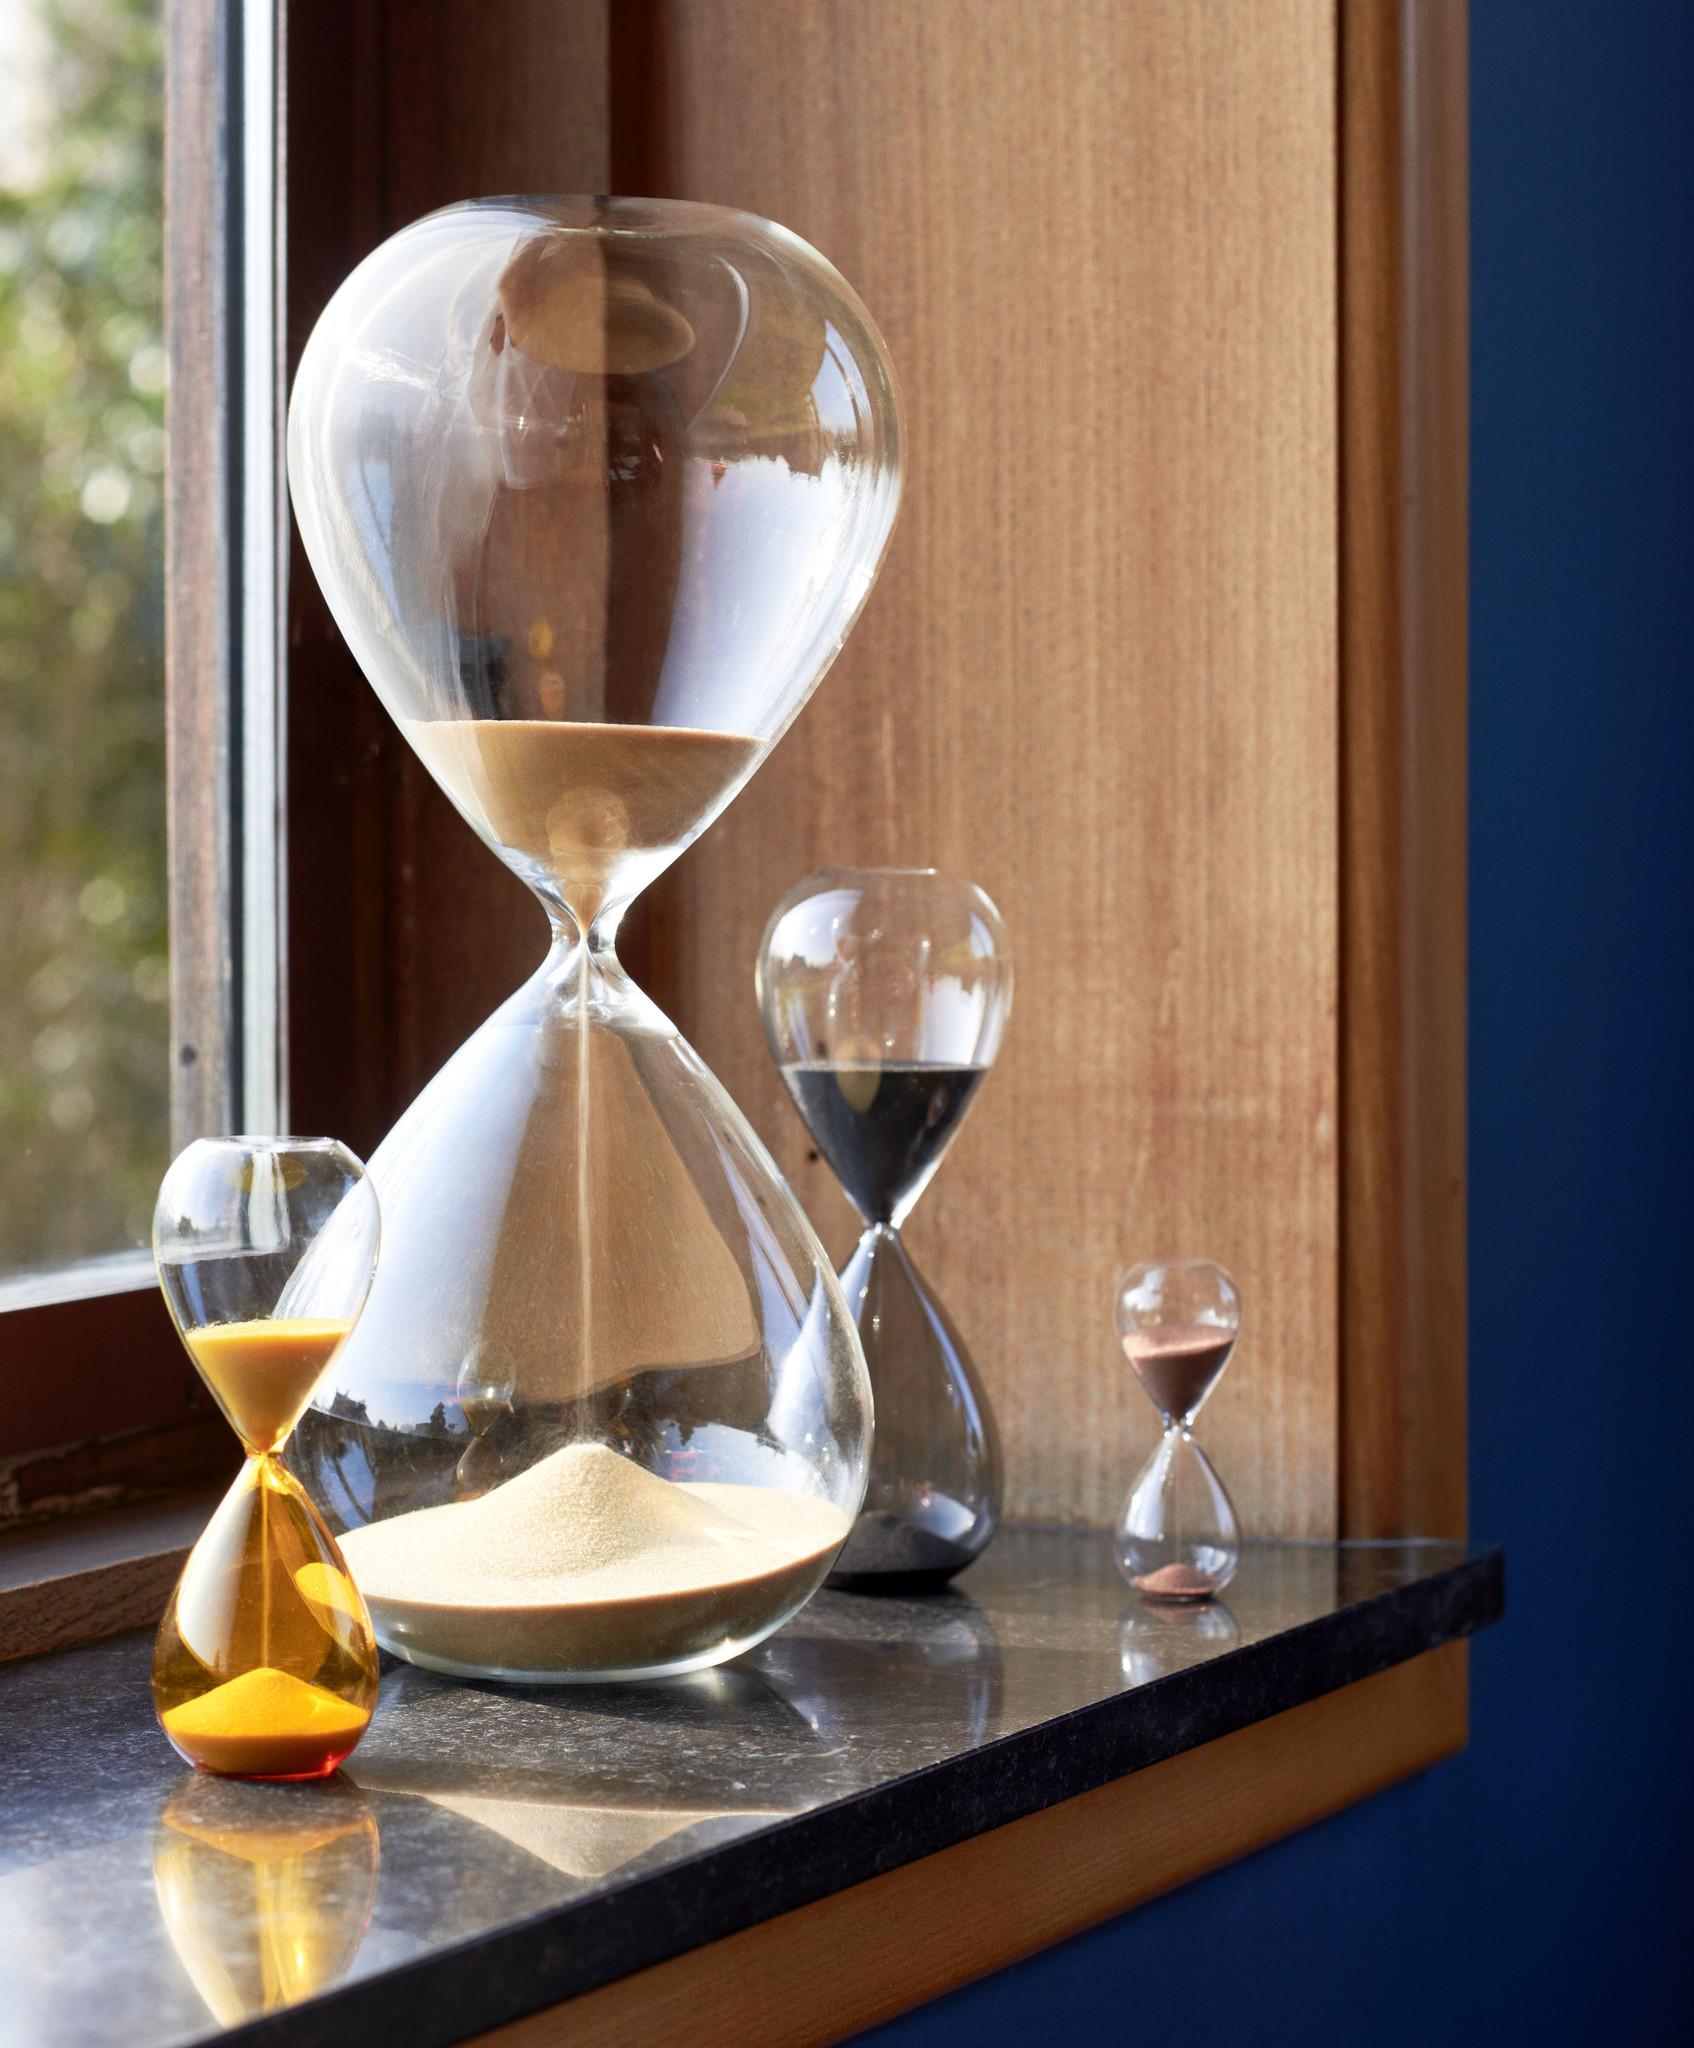 Time S (2019) 3 min-2